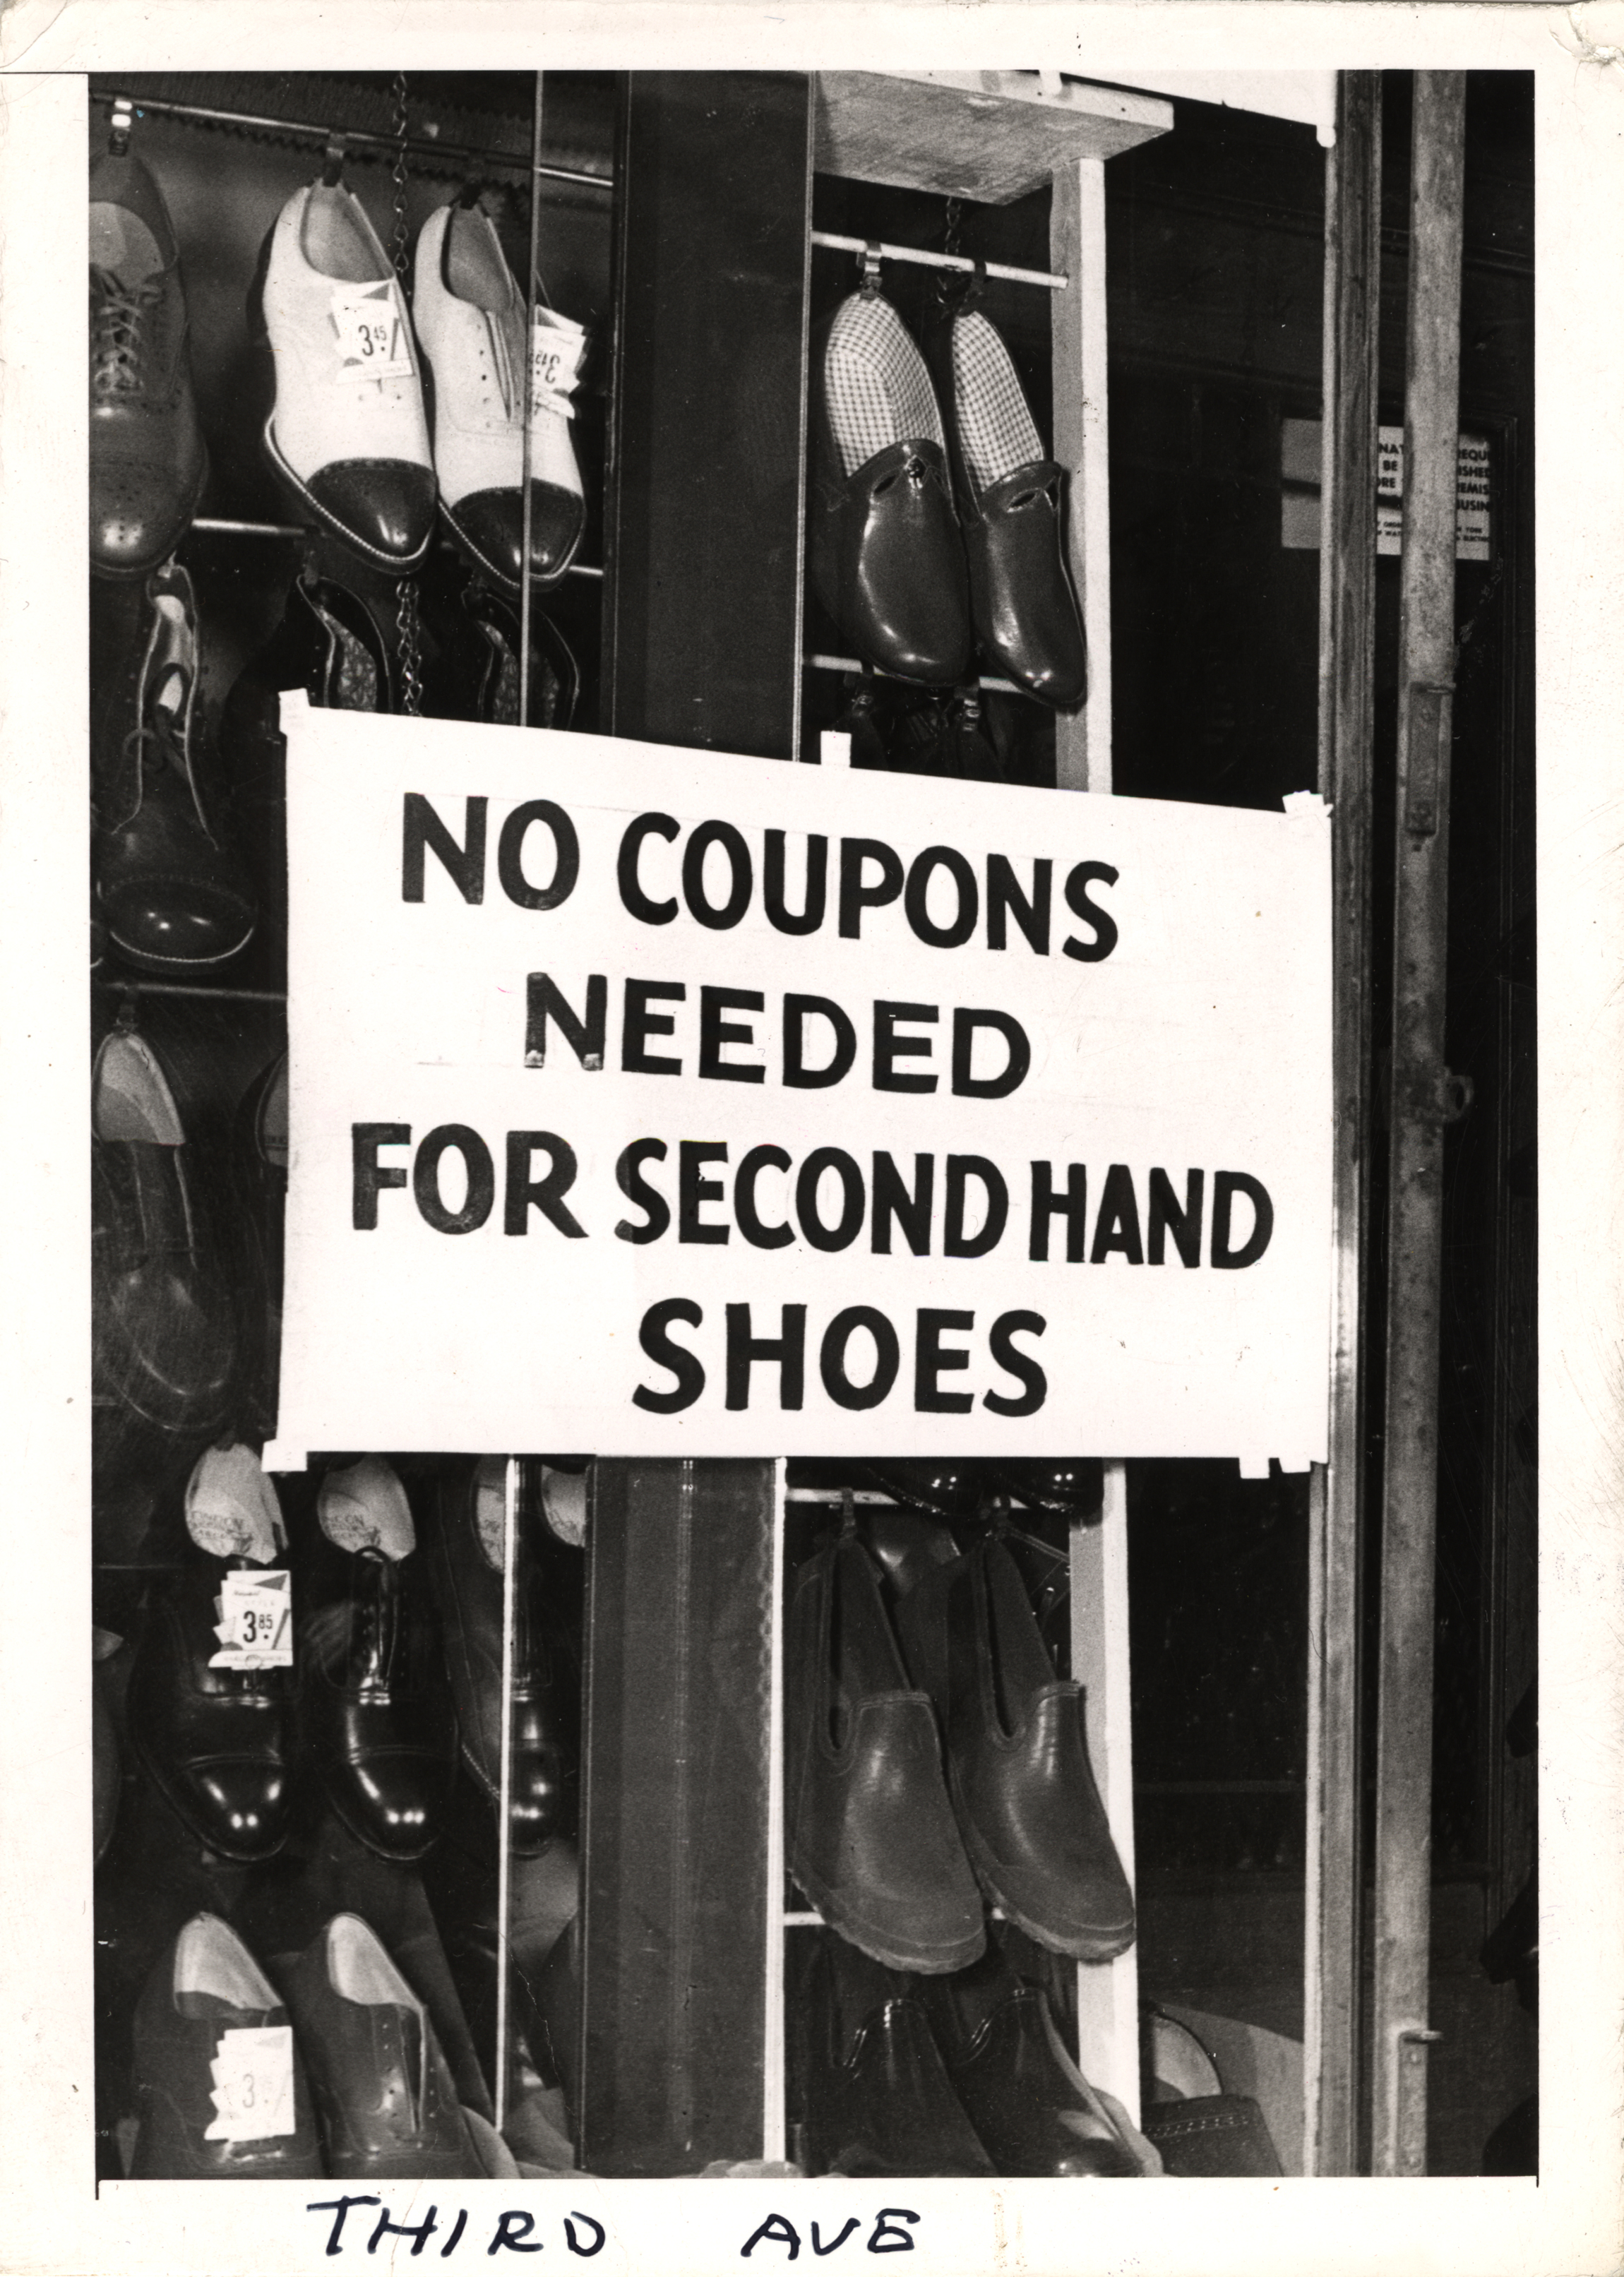 Second-hand shoe stores got a nice bump